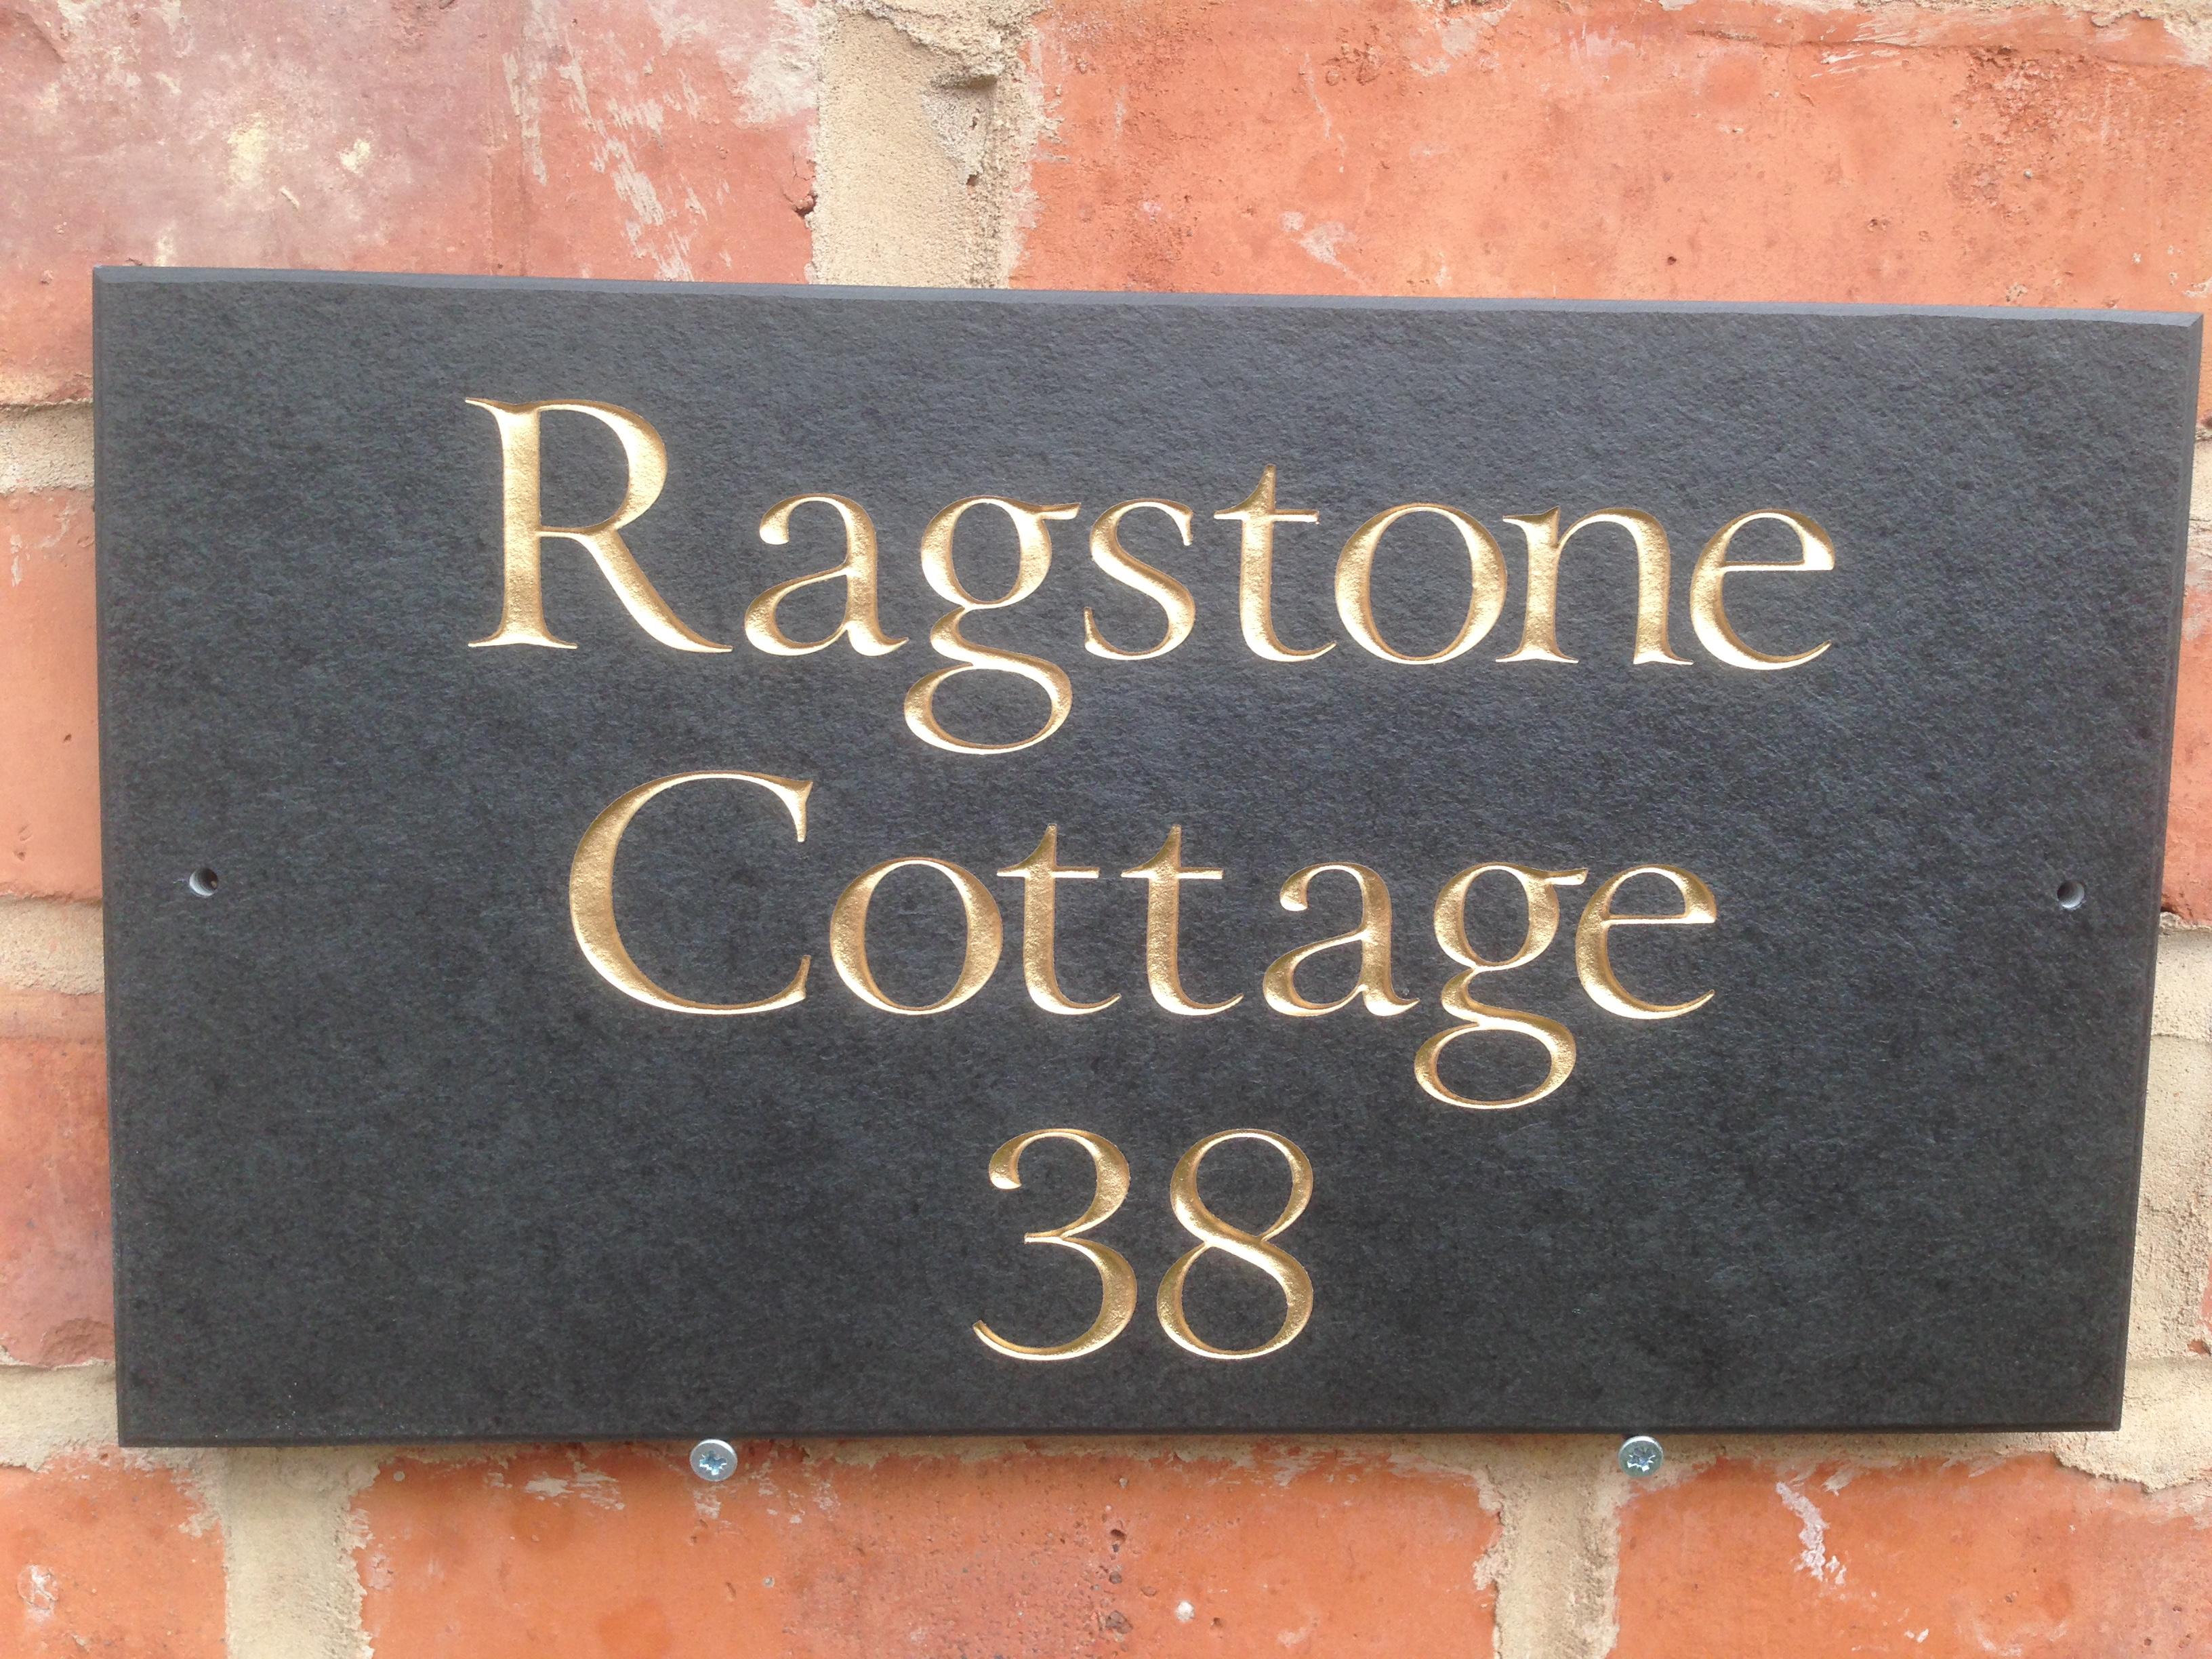 14 x 8 smooth slate house sign